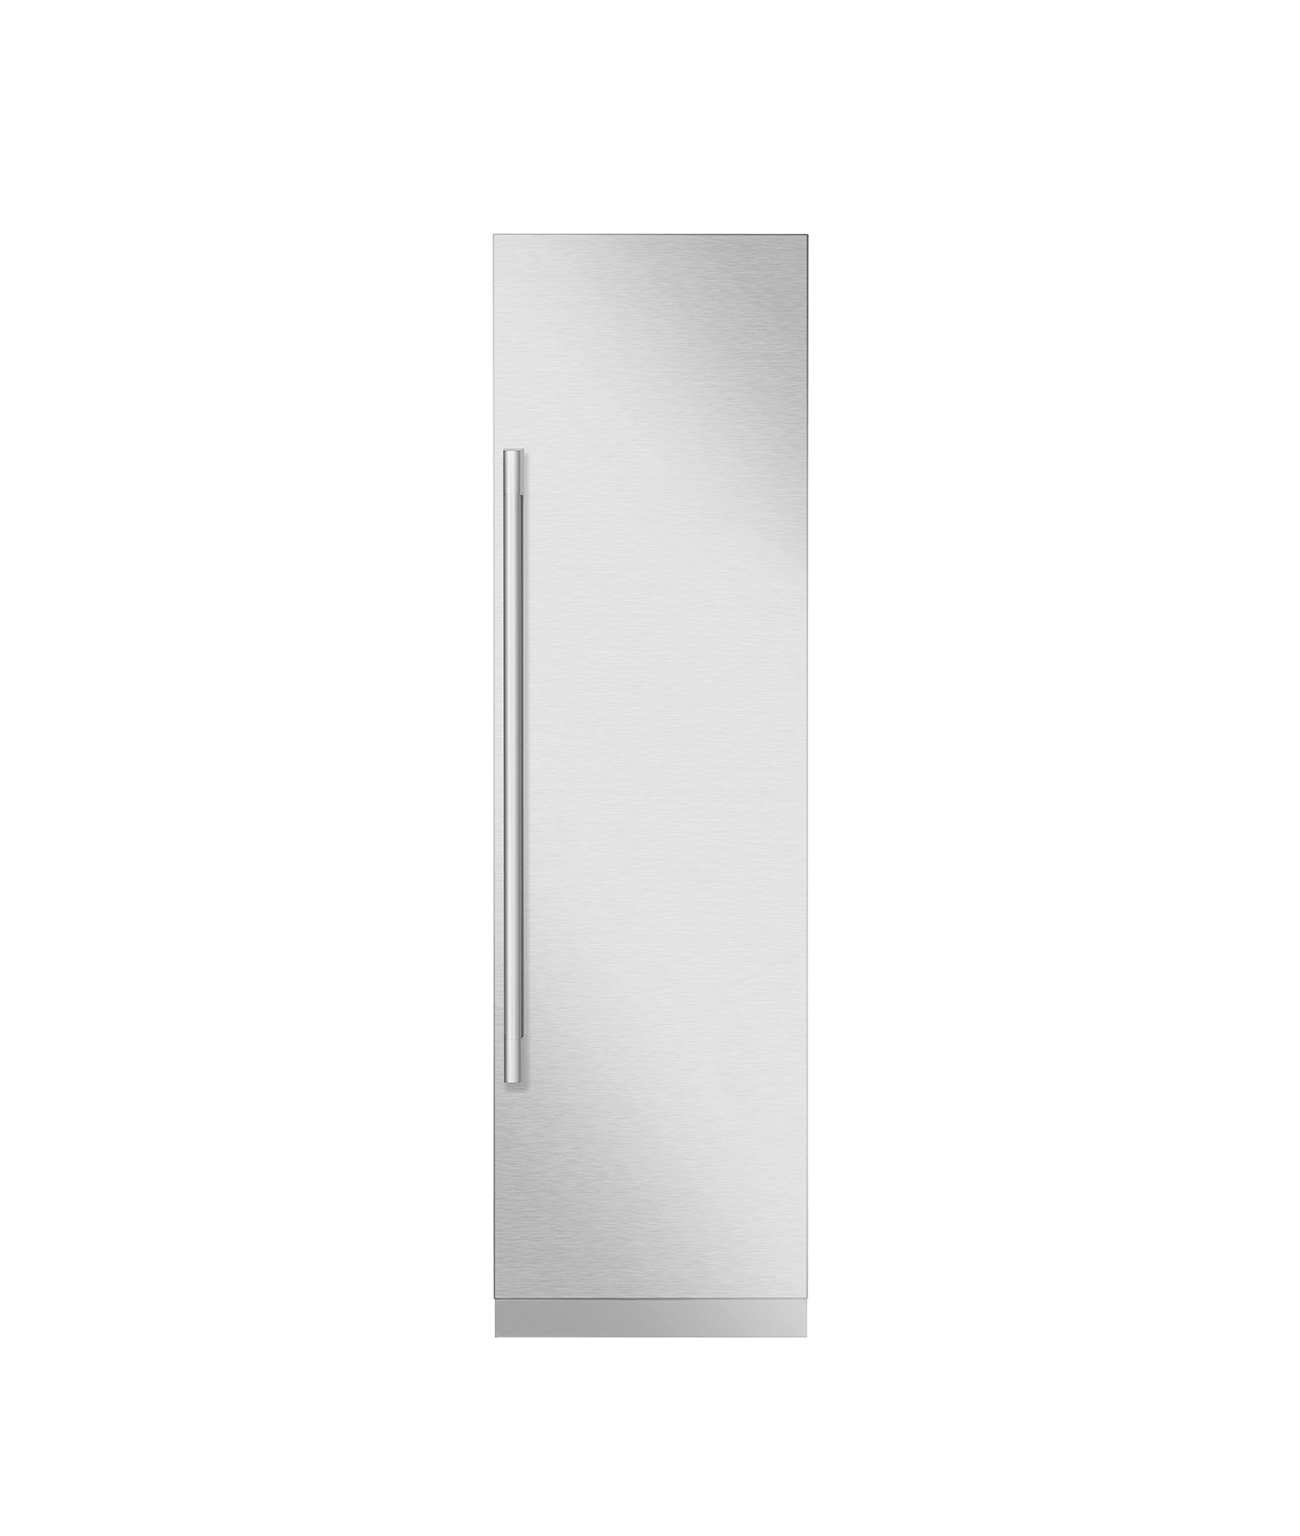 24-inch Integrated Column Refrigerator | Signature Kitchen Suite